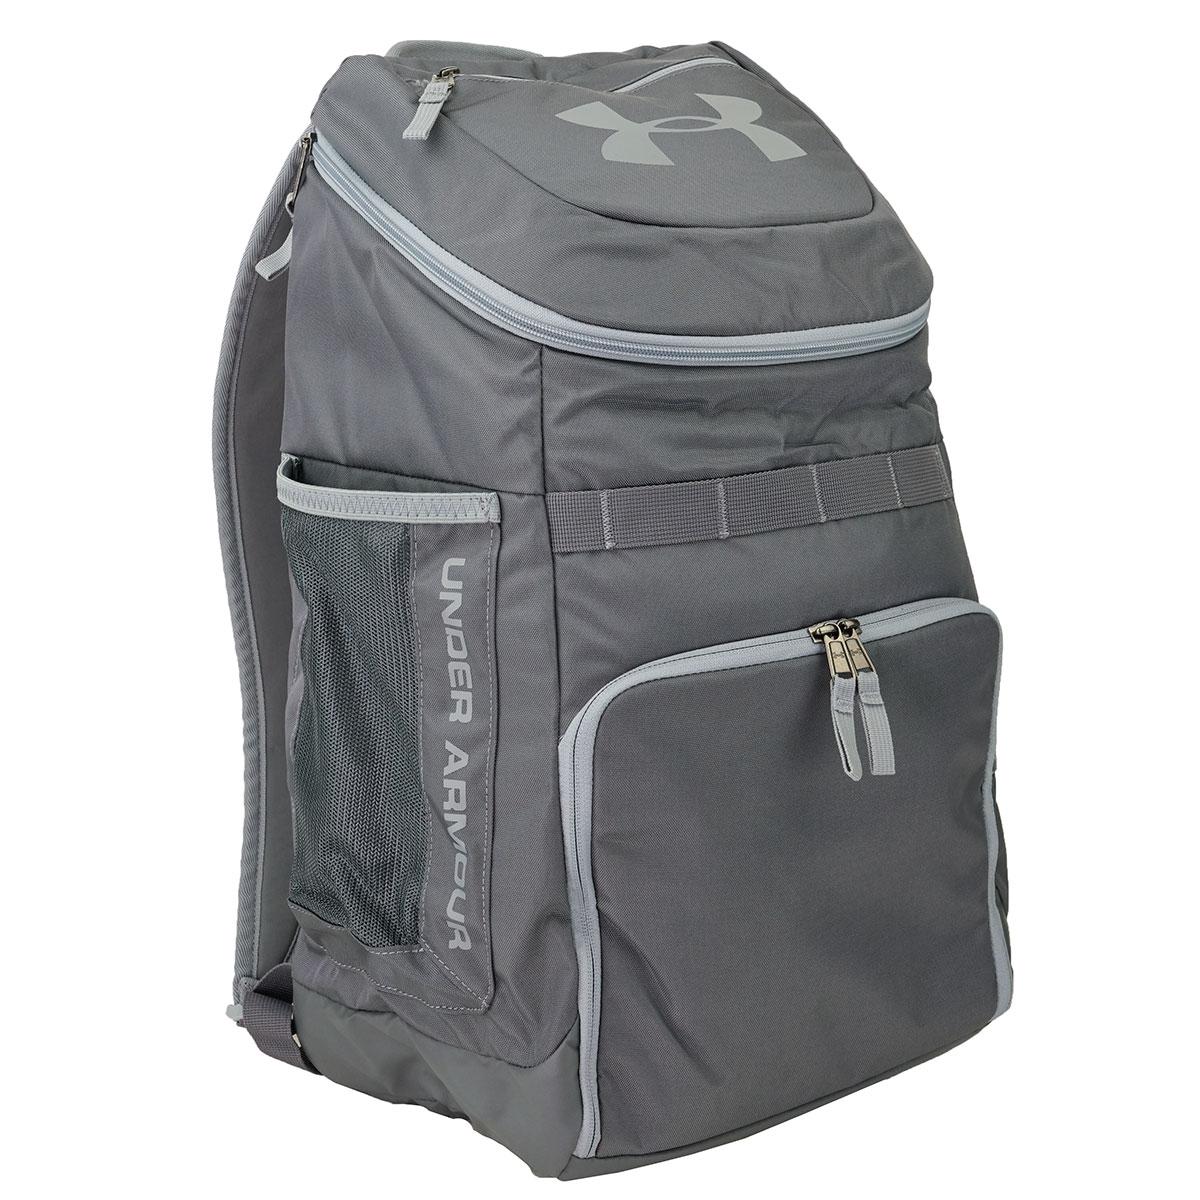 35e93818f7e3 Under Armour Undeniable Backpack Graphite 190863732610